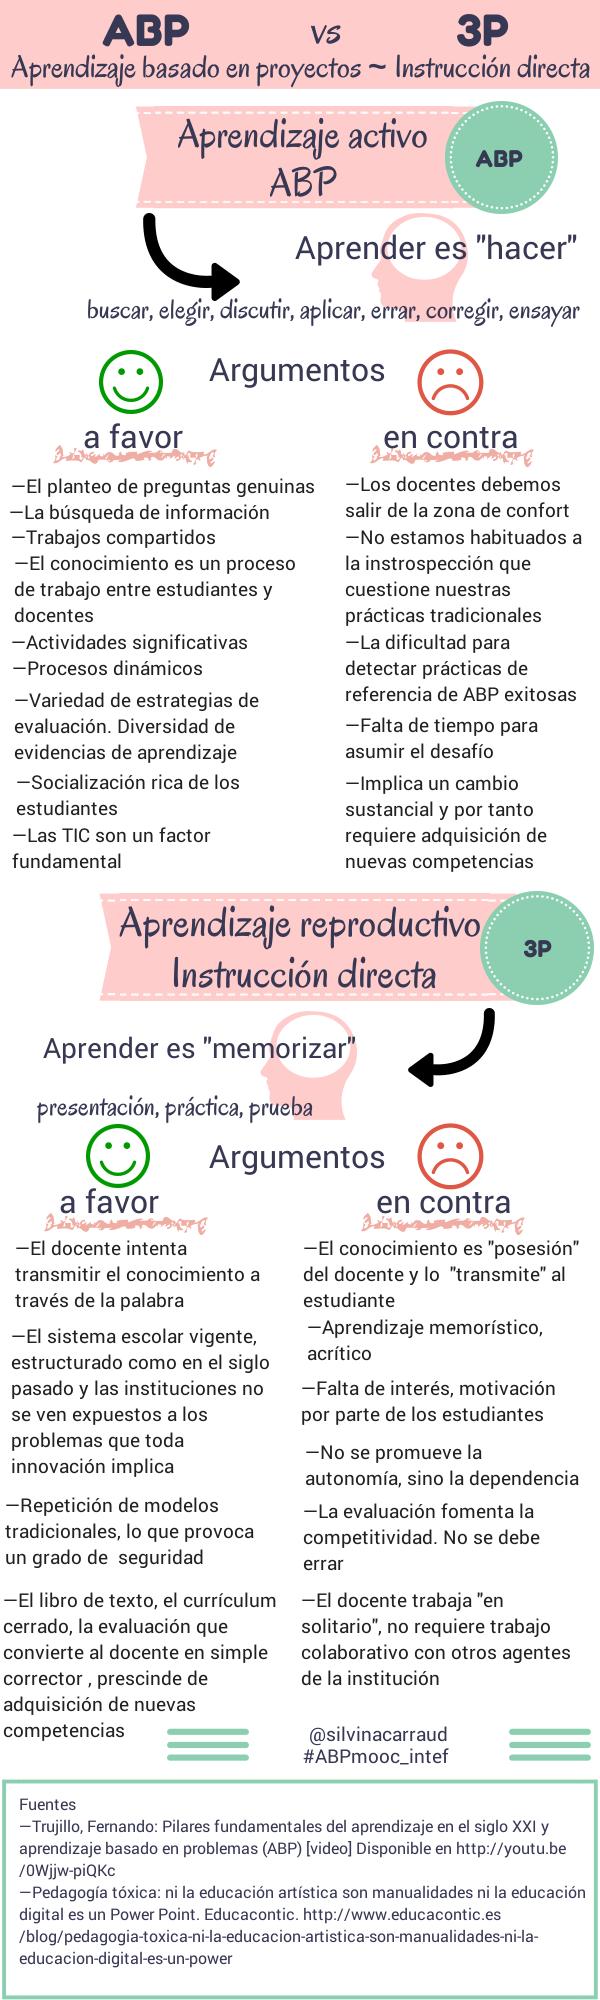 Aprendizaje activo vs Aprendizaje reproductivo